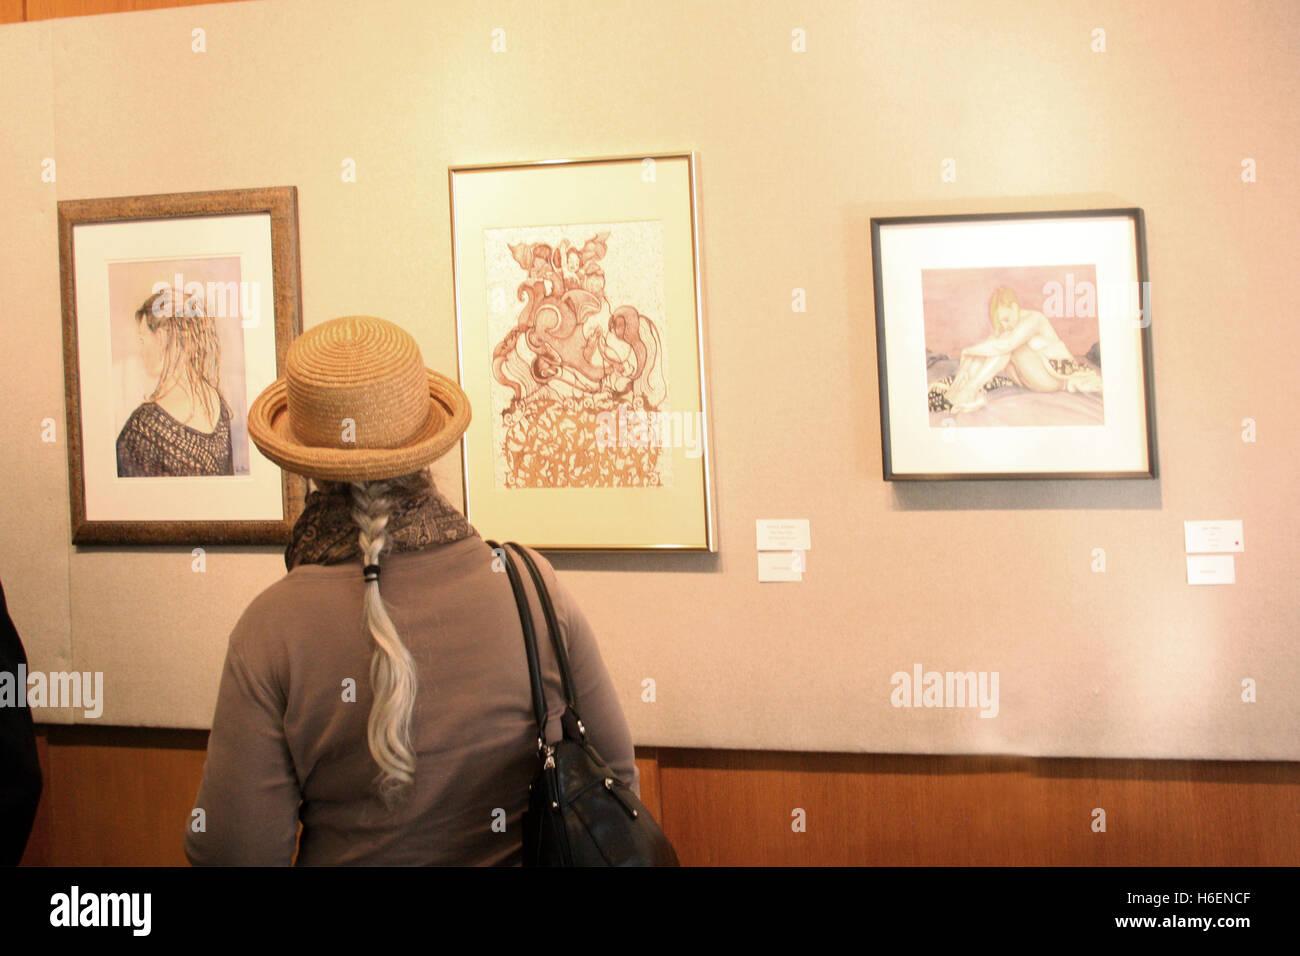 People looking at art display in gallery - Stock Image